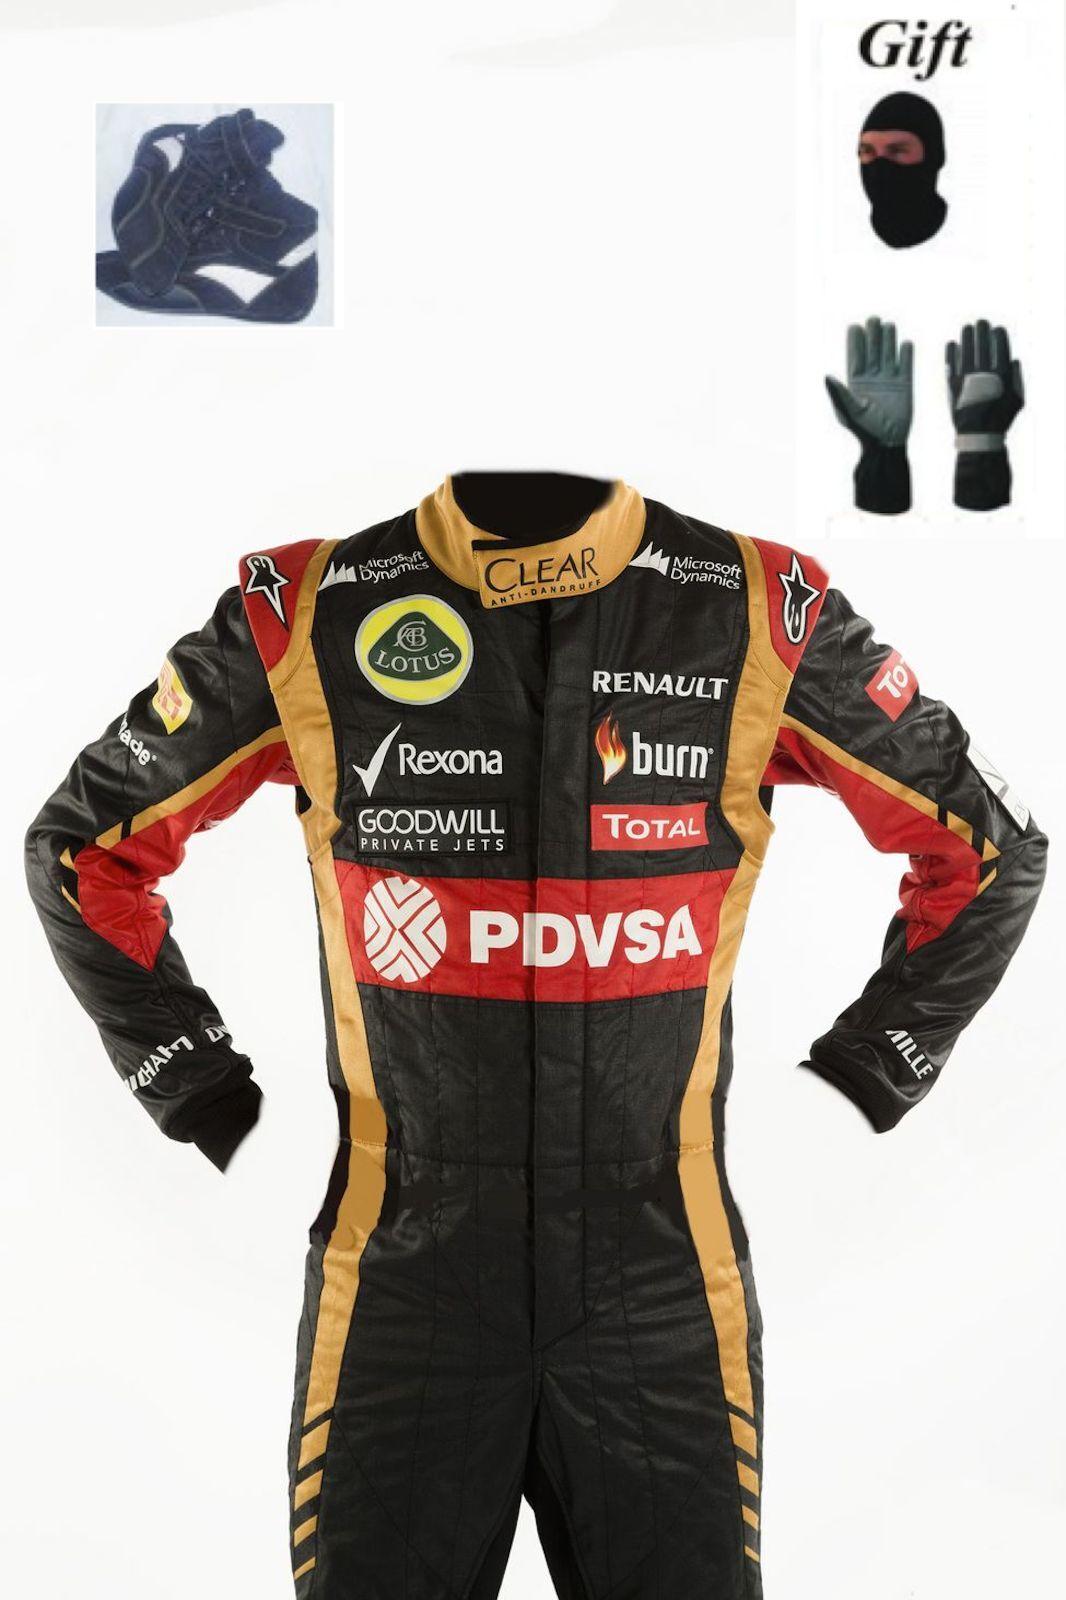 Lotus kart race suit KIT CIK FIA level 2  2014 style(free gifts)  wholesale